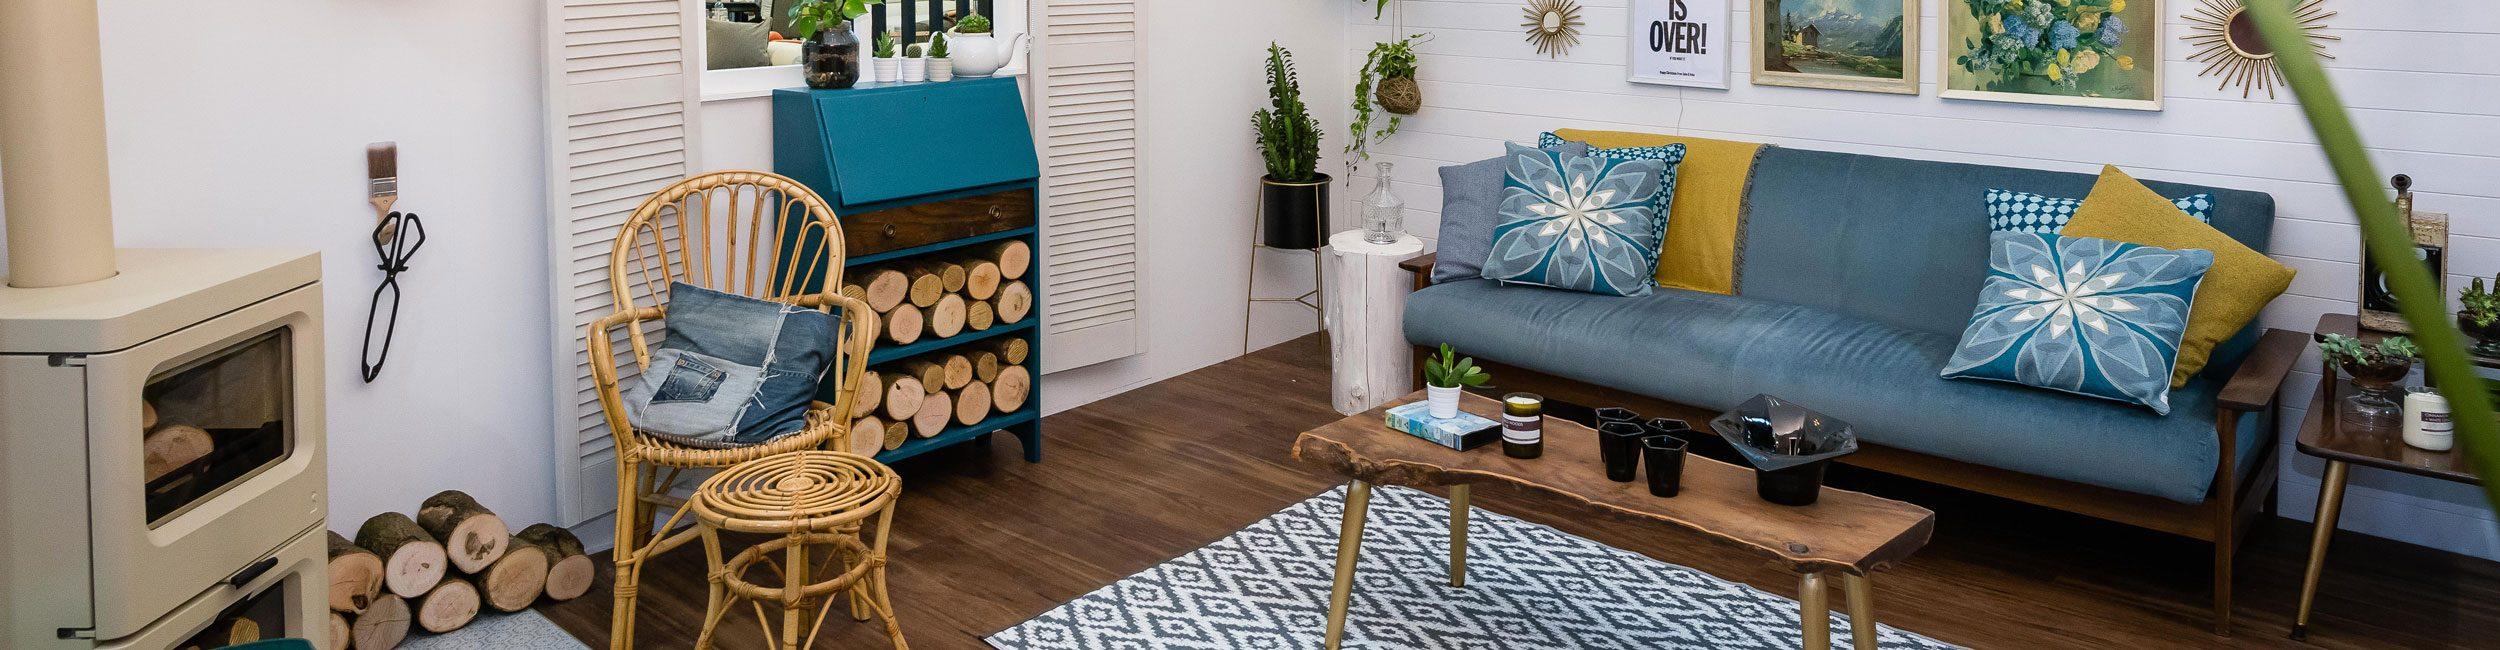 Grand Designs Live 2019 - Enaflo Interiors